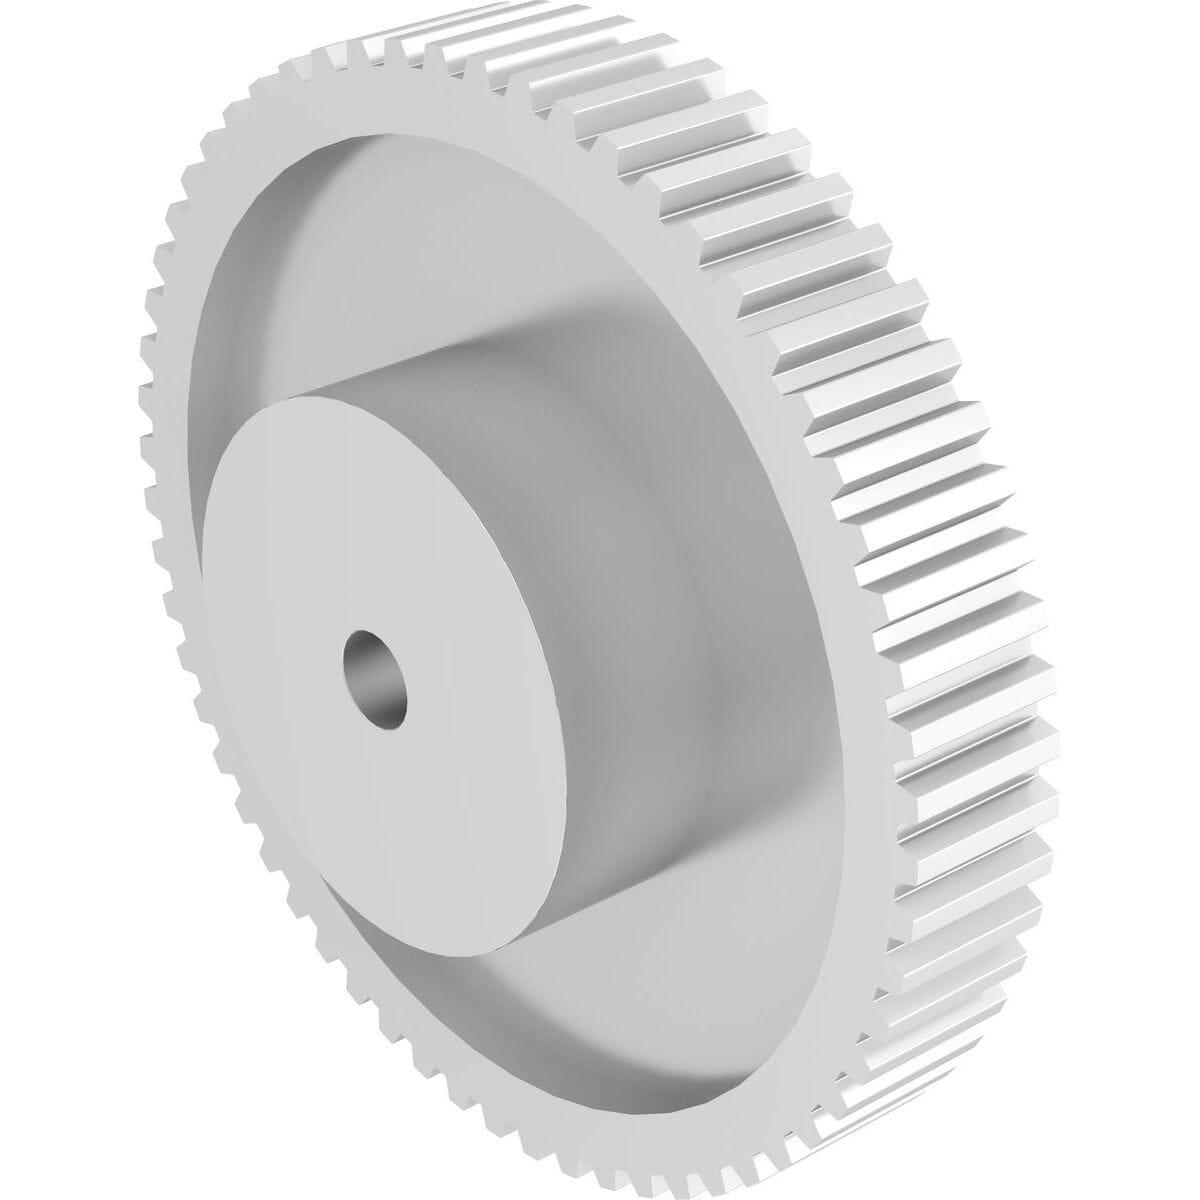 60 Teeth x 9.53mm Belt Width, XL Type Precision Timing Pulleys - P60XL037